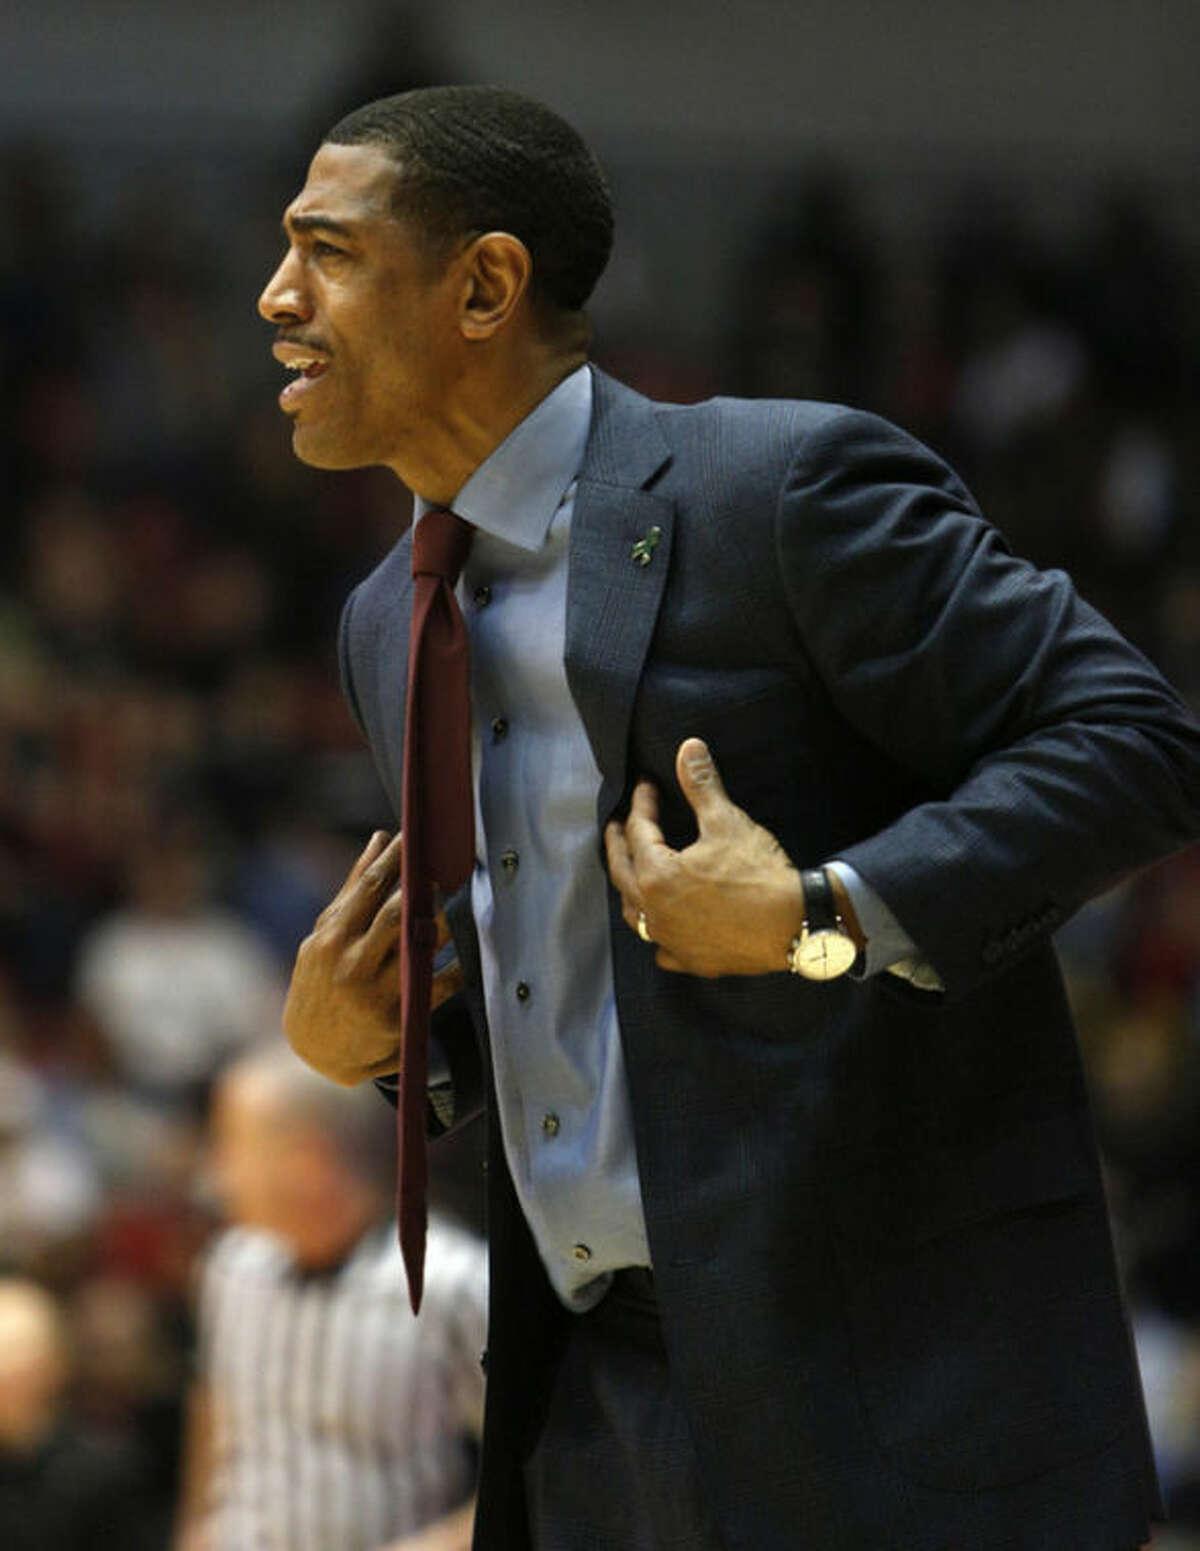 Connecticut head coach Kevin Ollie reacts during the first half of an NCAA basketball game against Cincinnati, Saturday, March 2, 2013, in Cincinnati. (AP Photo/David Kohl)